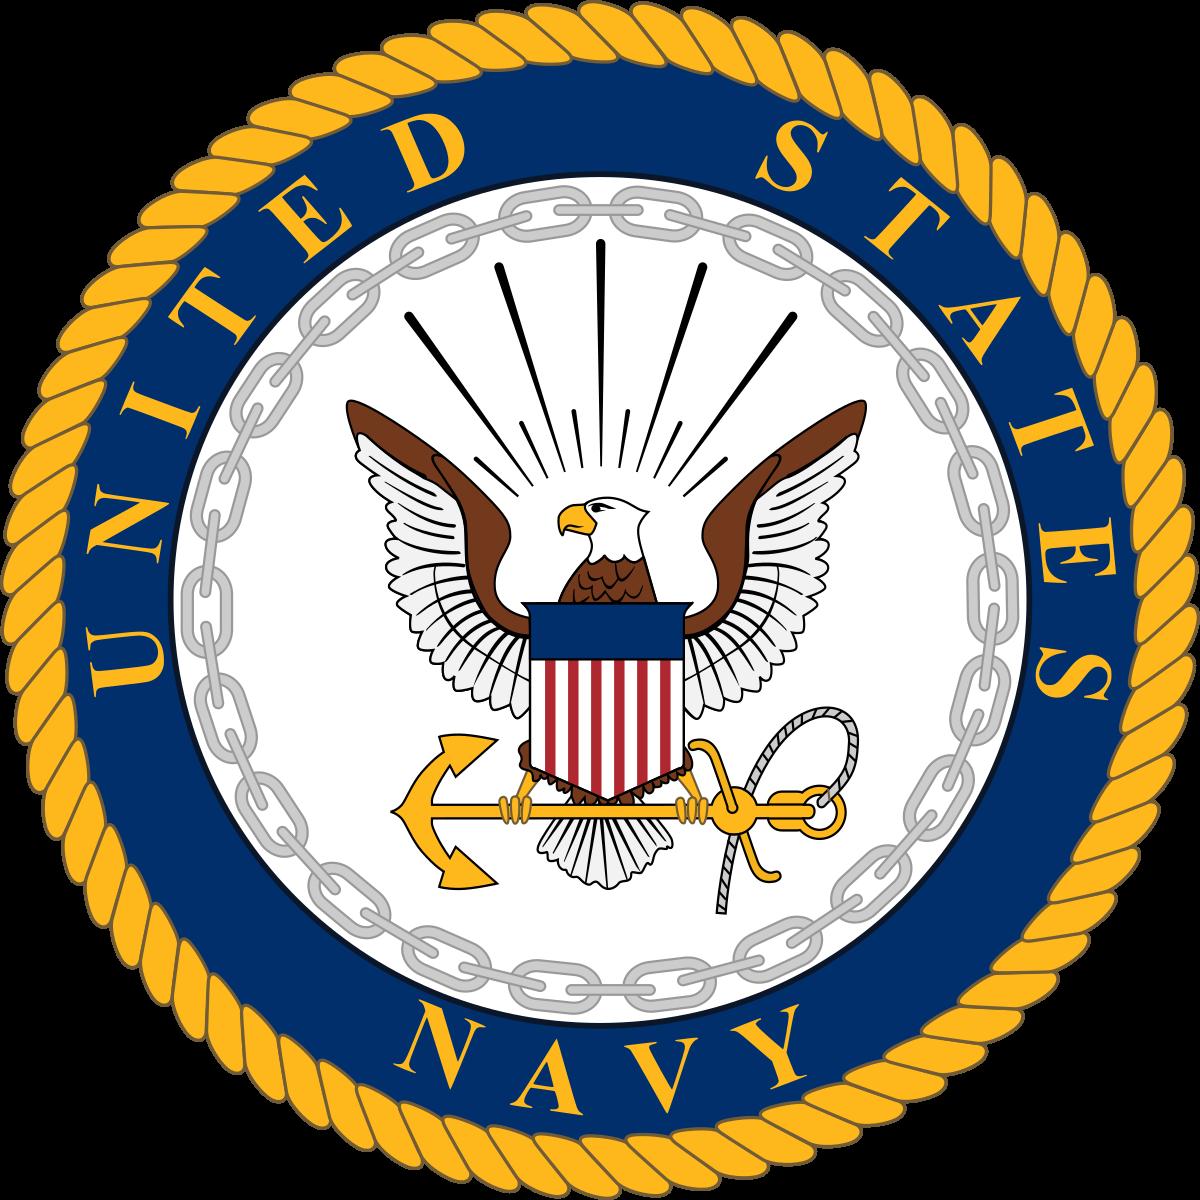 U.S. Navy Themed Items